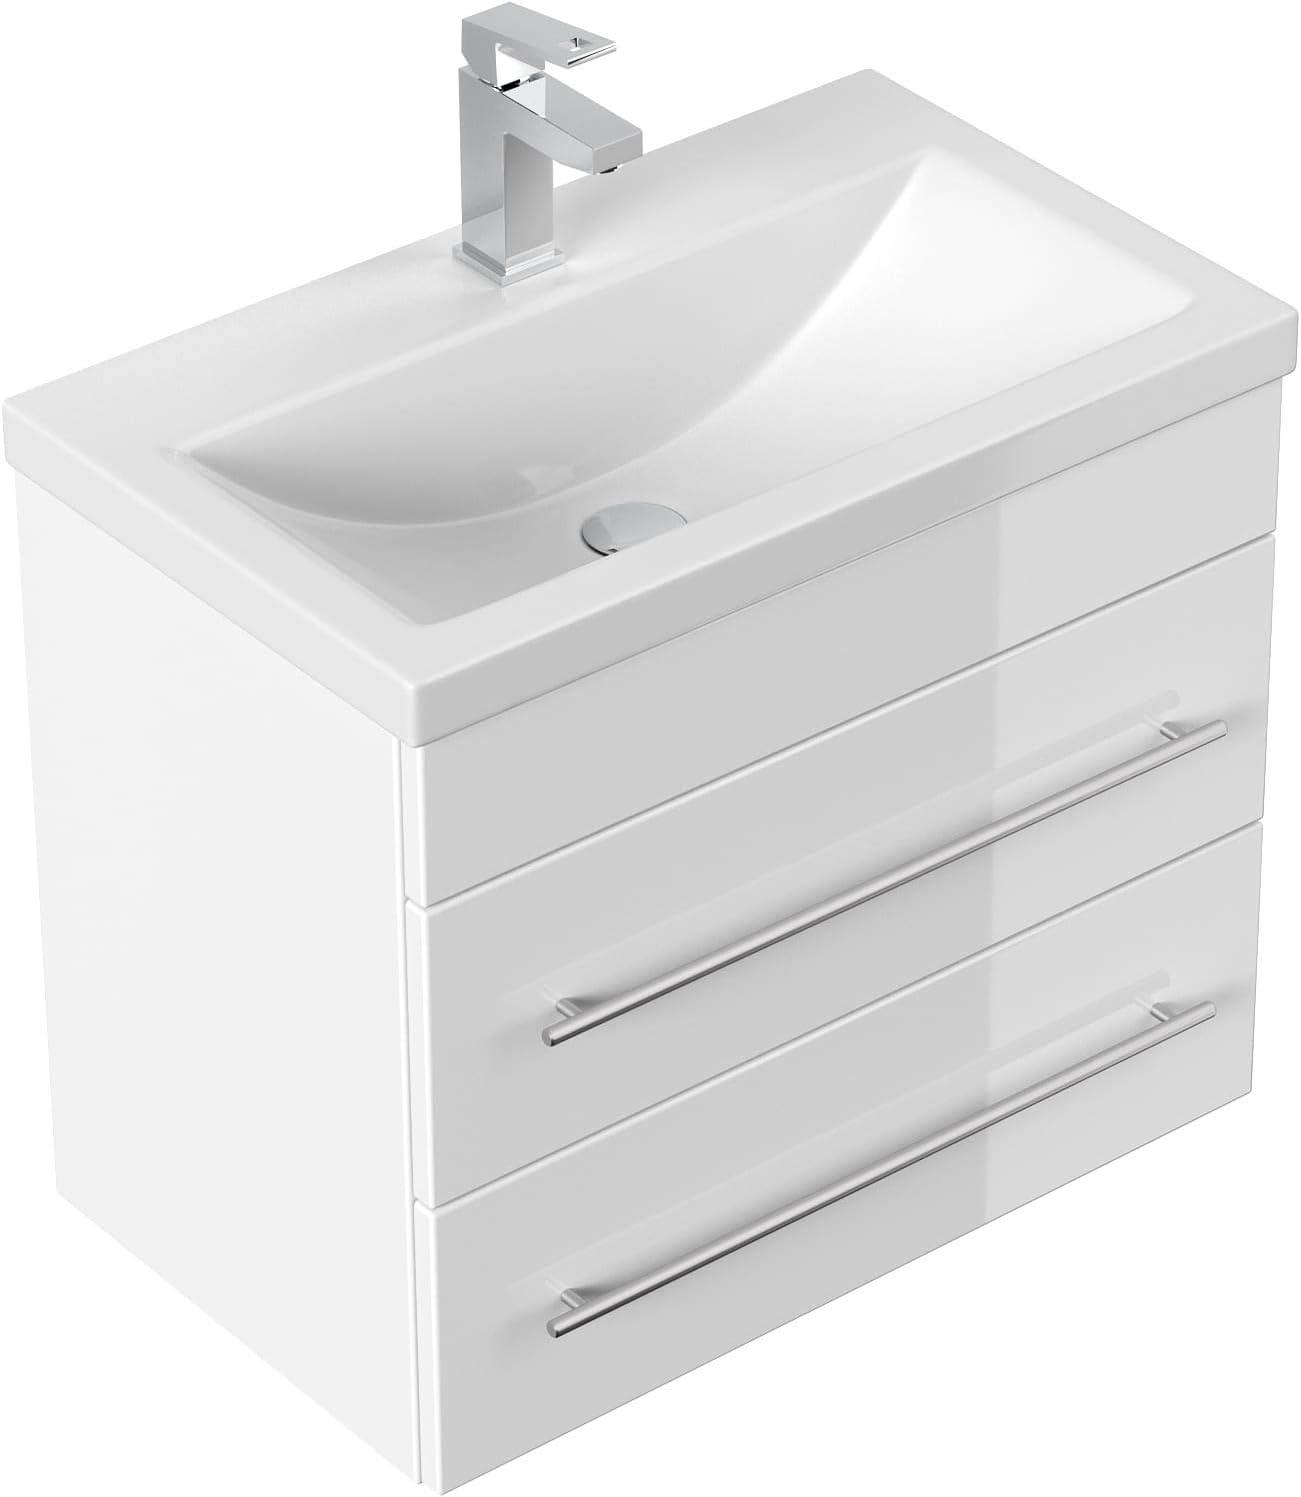 emotion Bathroom Furniture Mars 3 SlimLine White High-Gloss